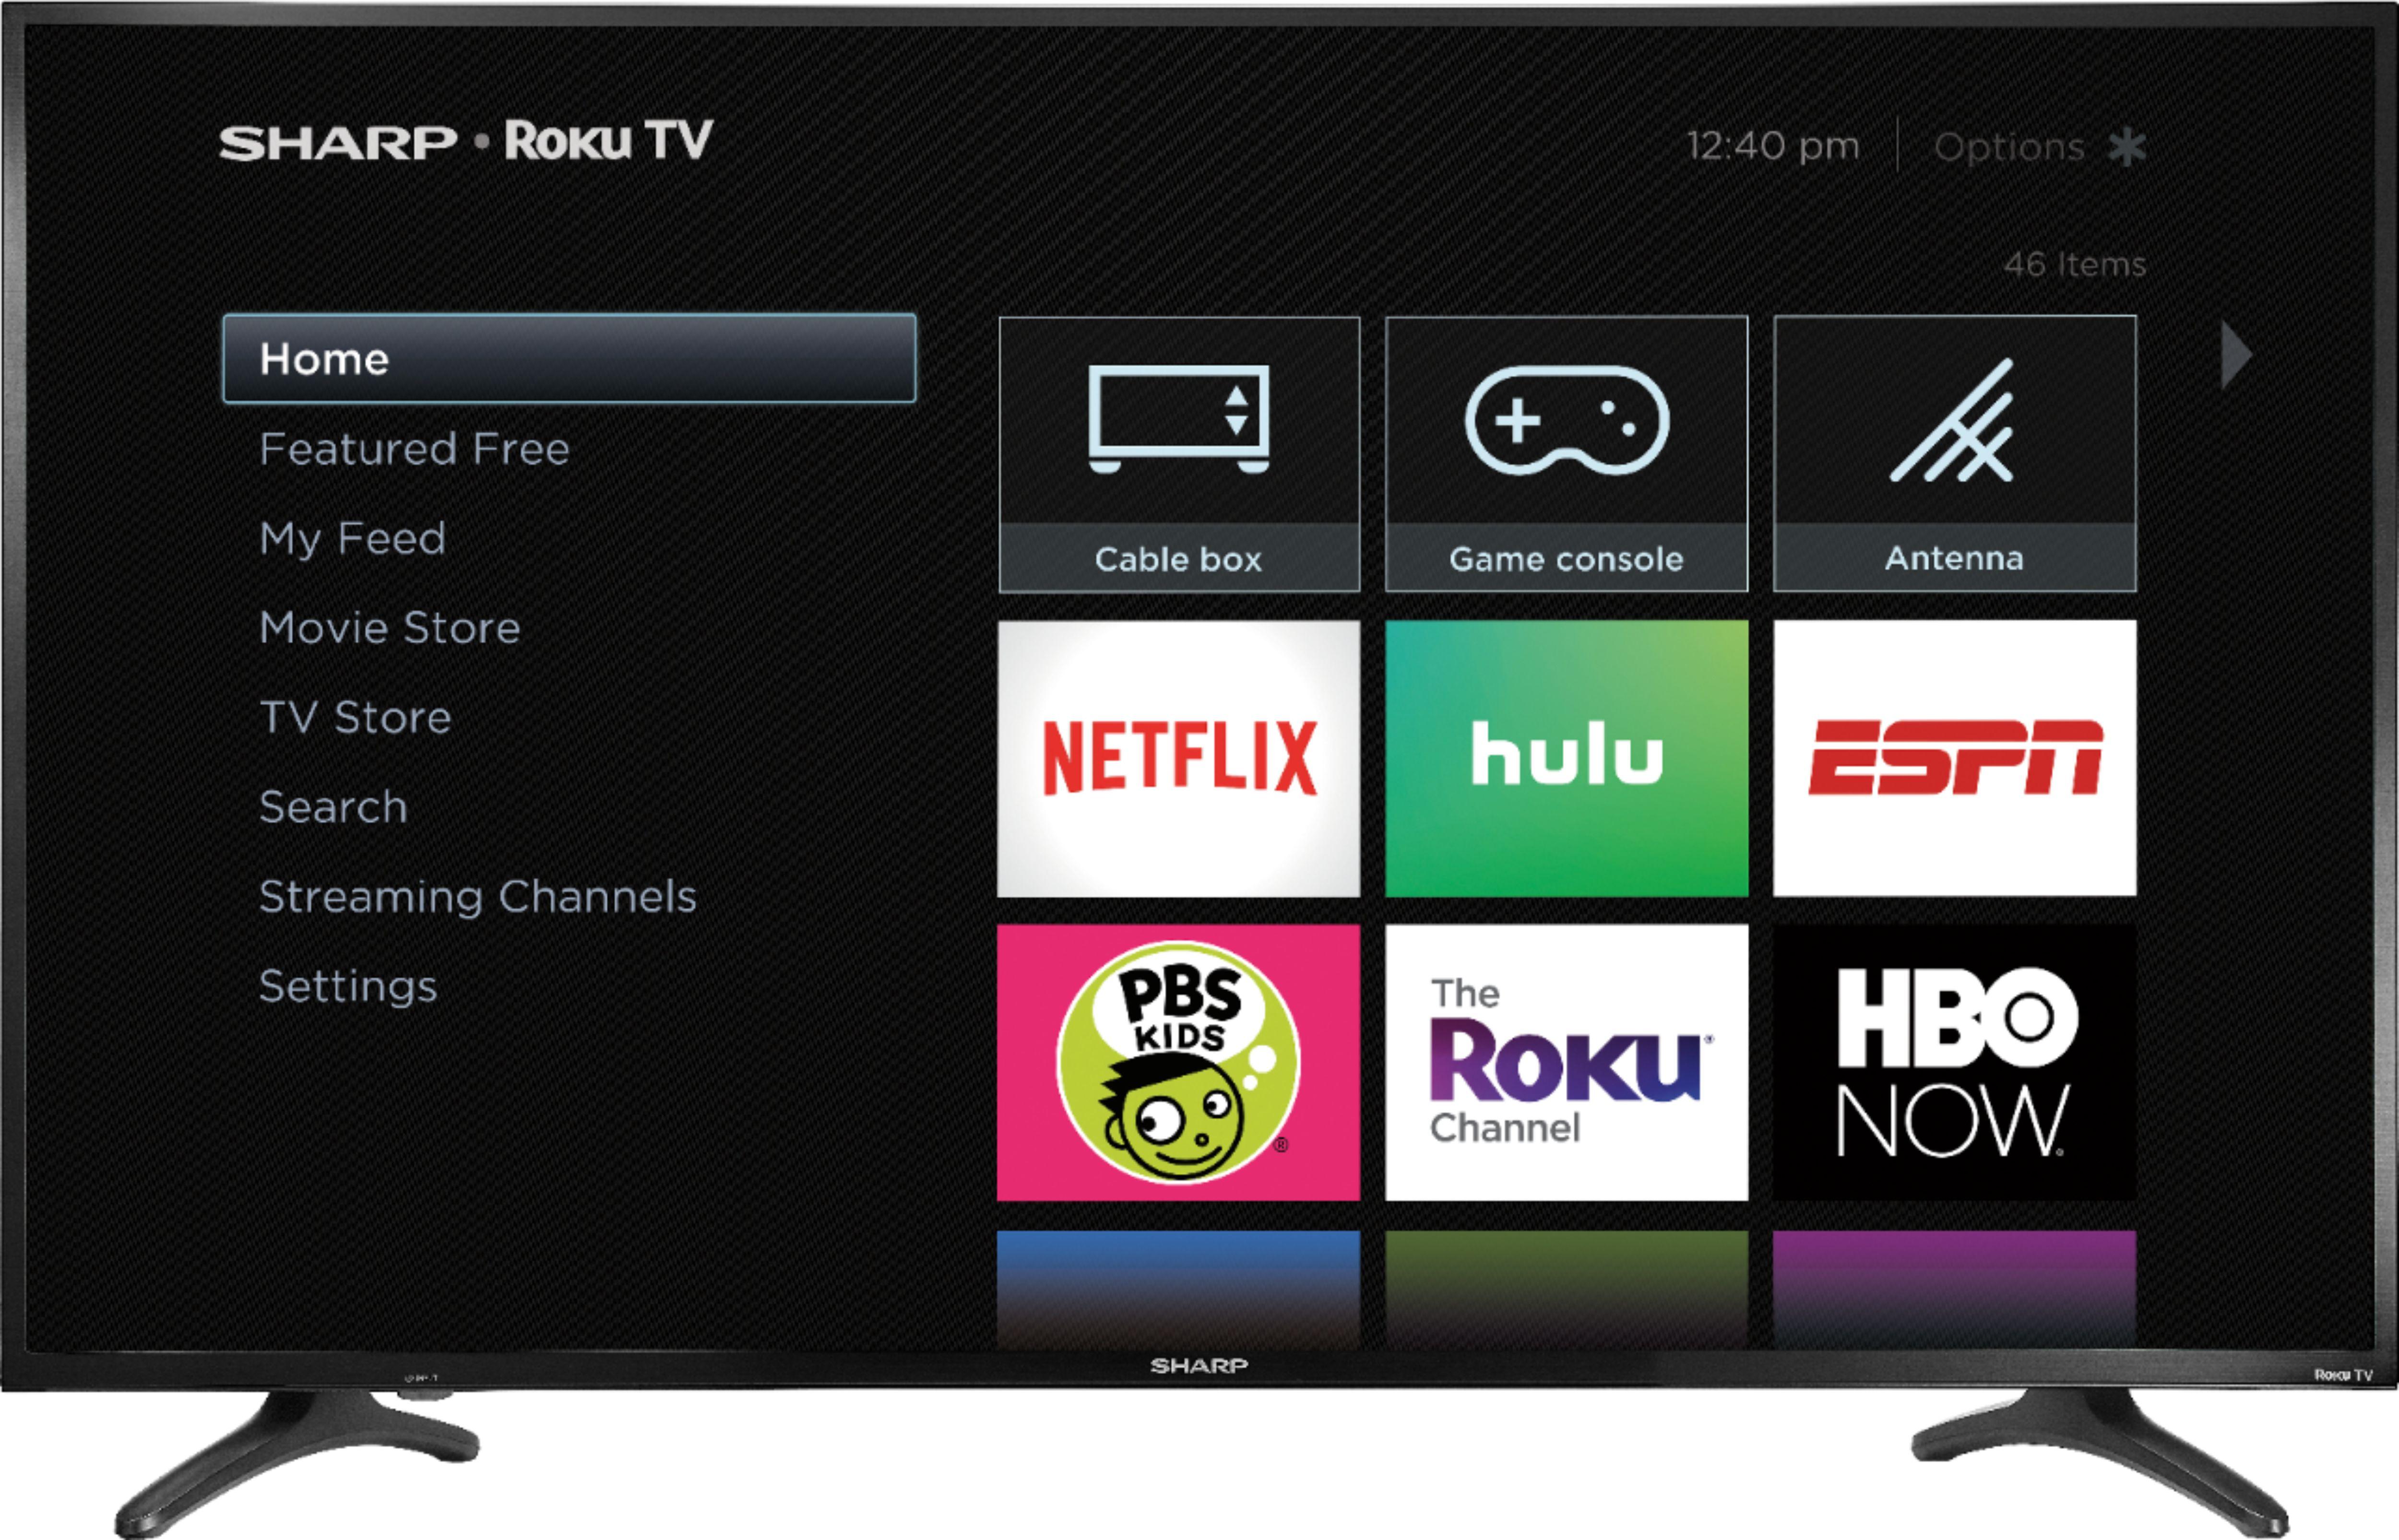 "Sharp - 50"" Class - LED - 2160p - Smart - 4K UHD TV with HDR - Roku TV $239.99"